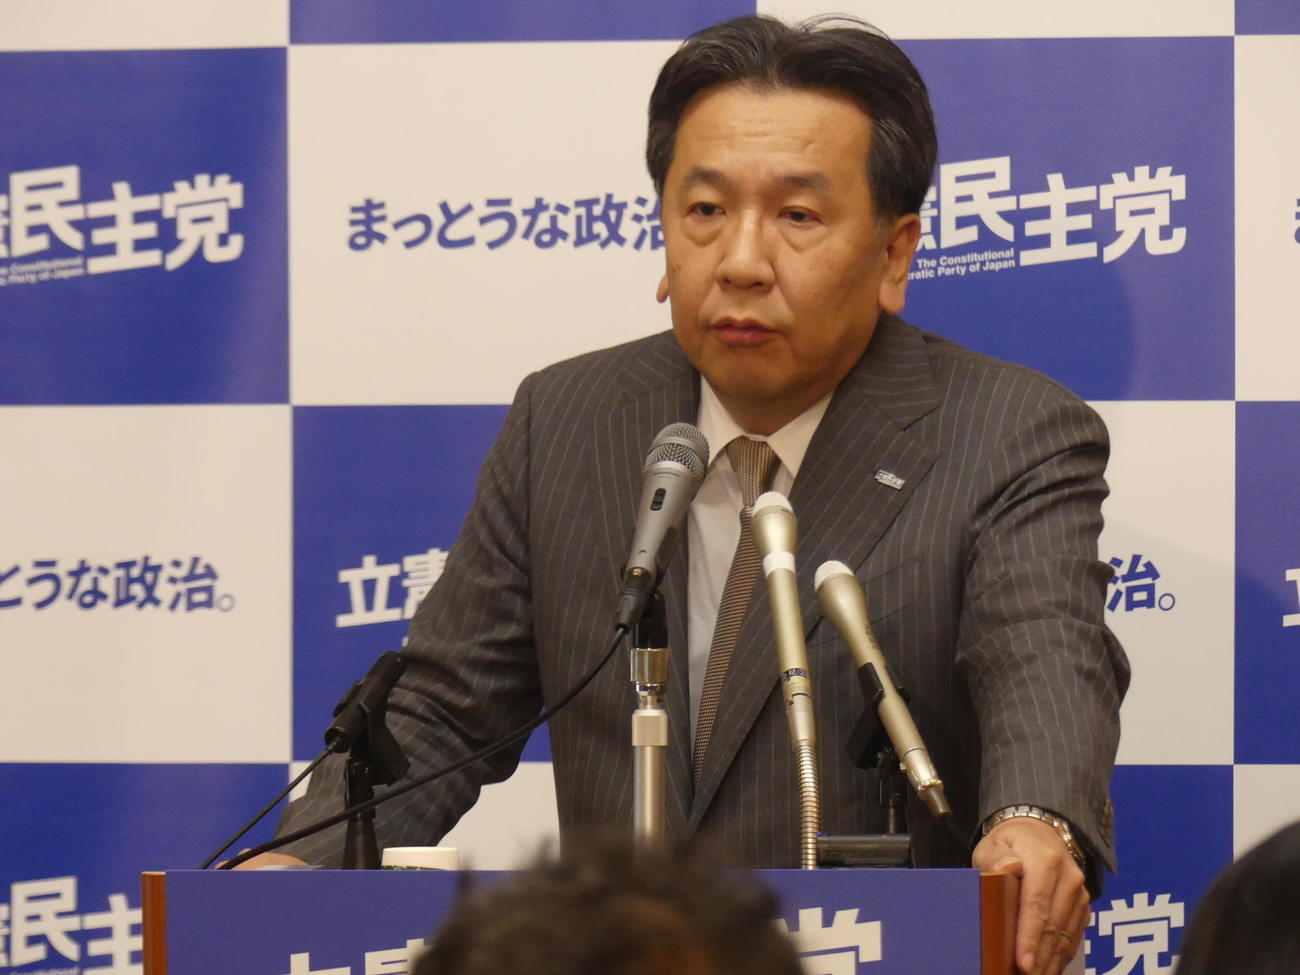 立憲民主党の枝野幸男代表(2019年12月26日撮影)